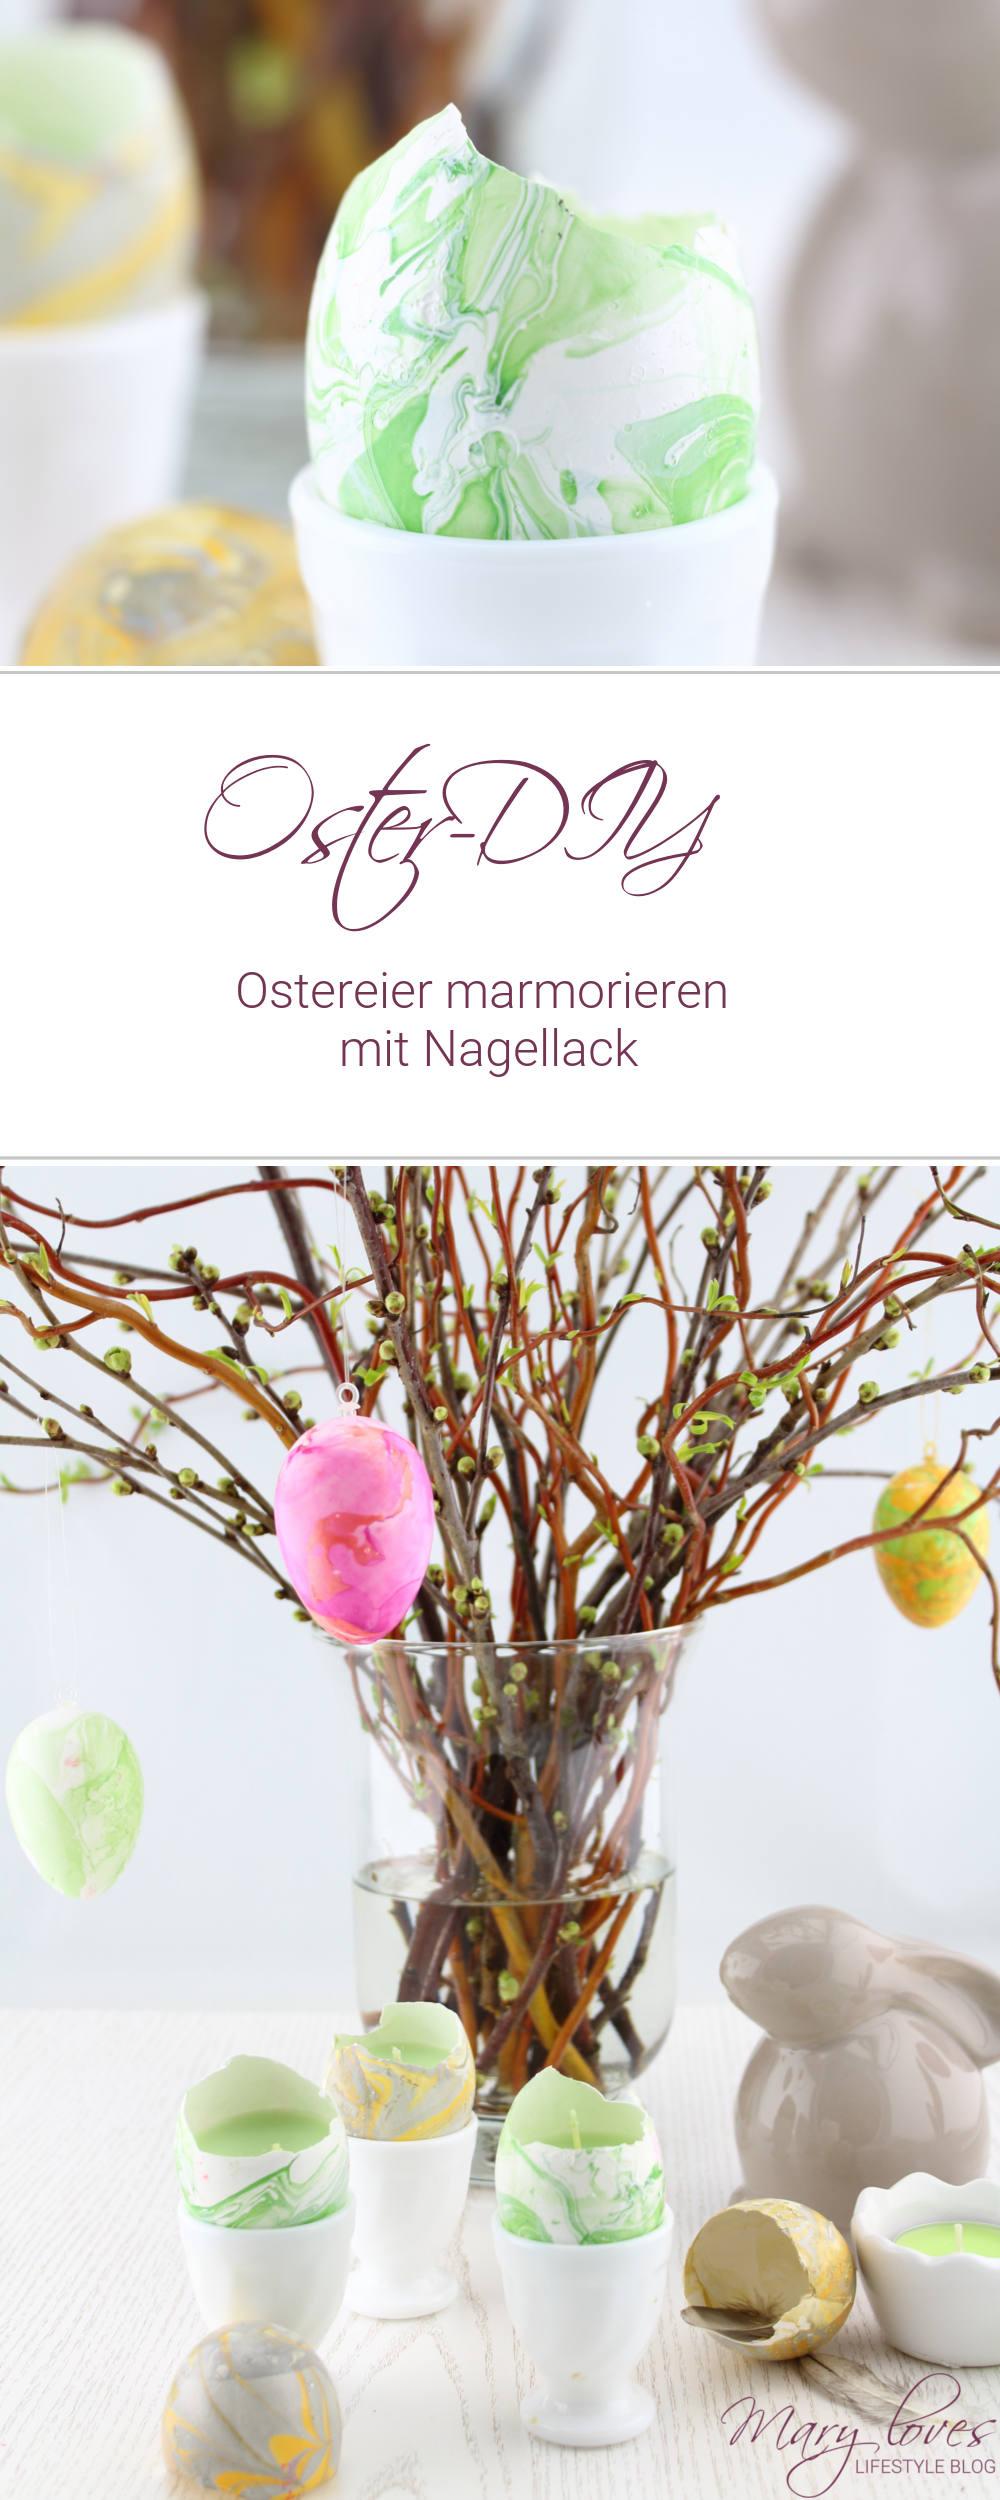 Oster-DIY] Ostereier marmorieren mit Nagellack - watermarble easter ...